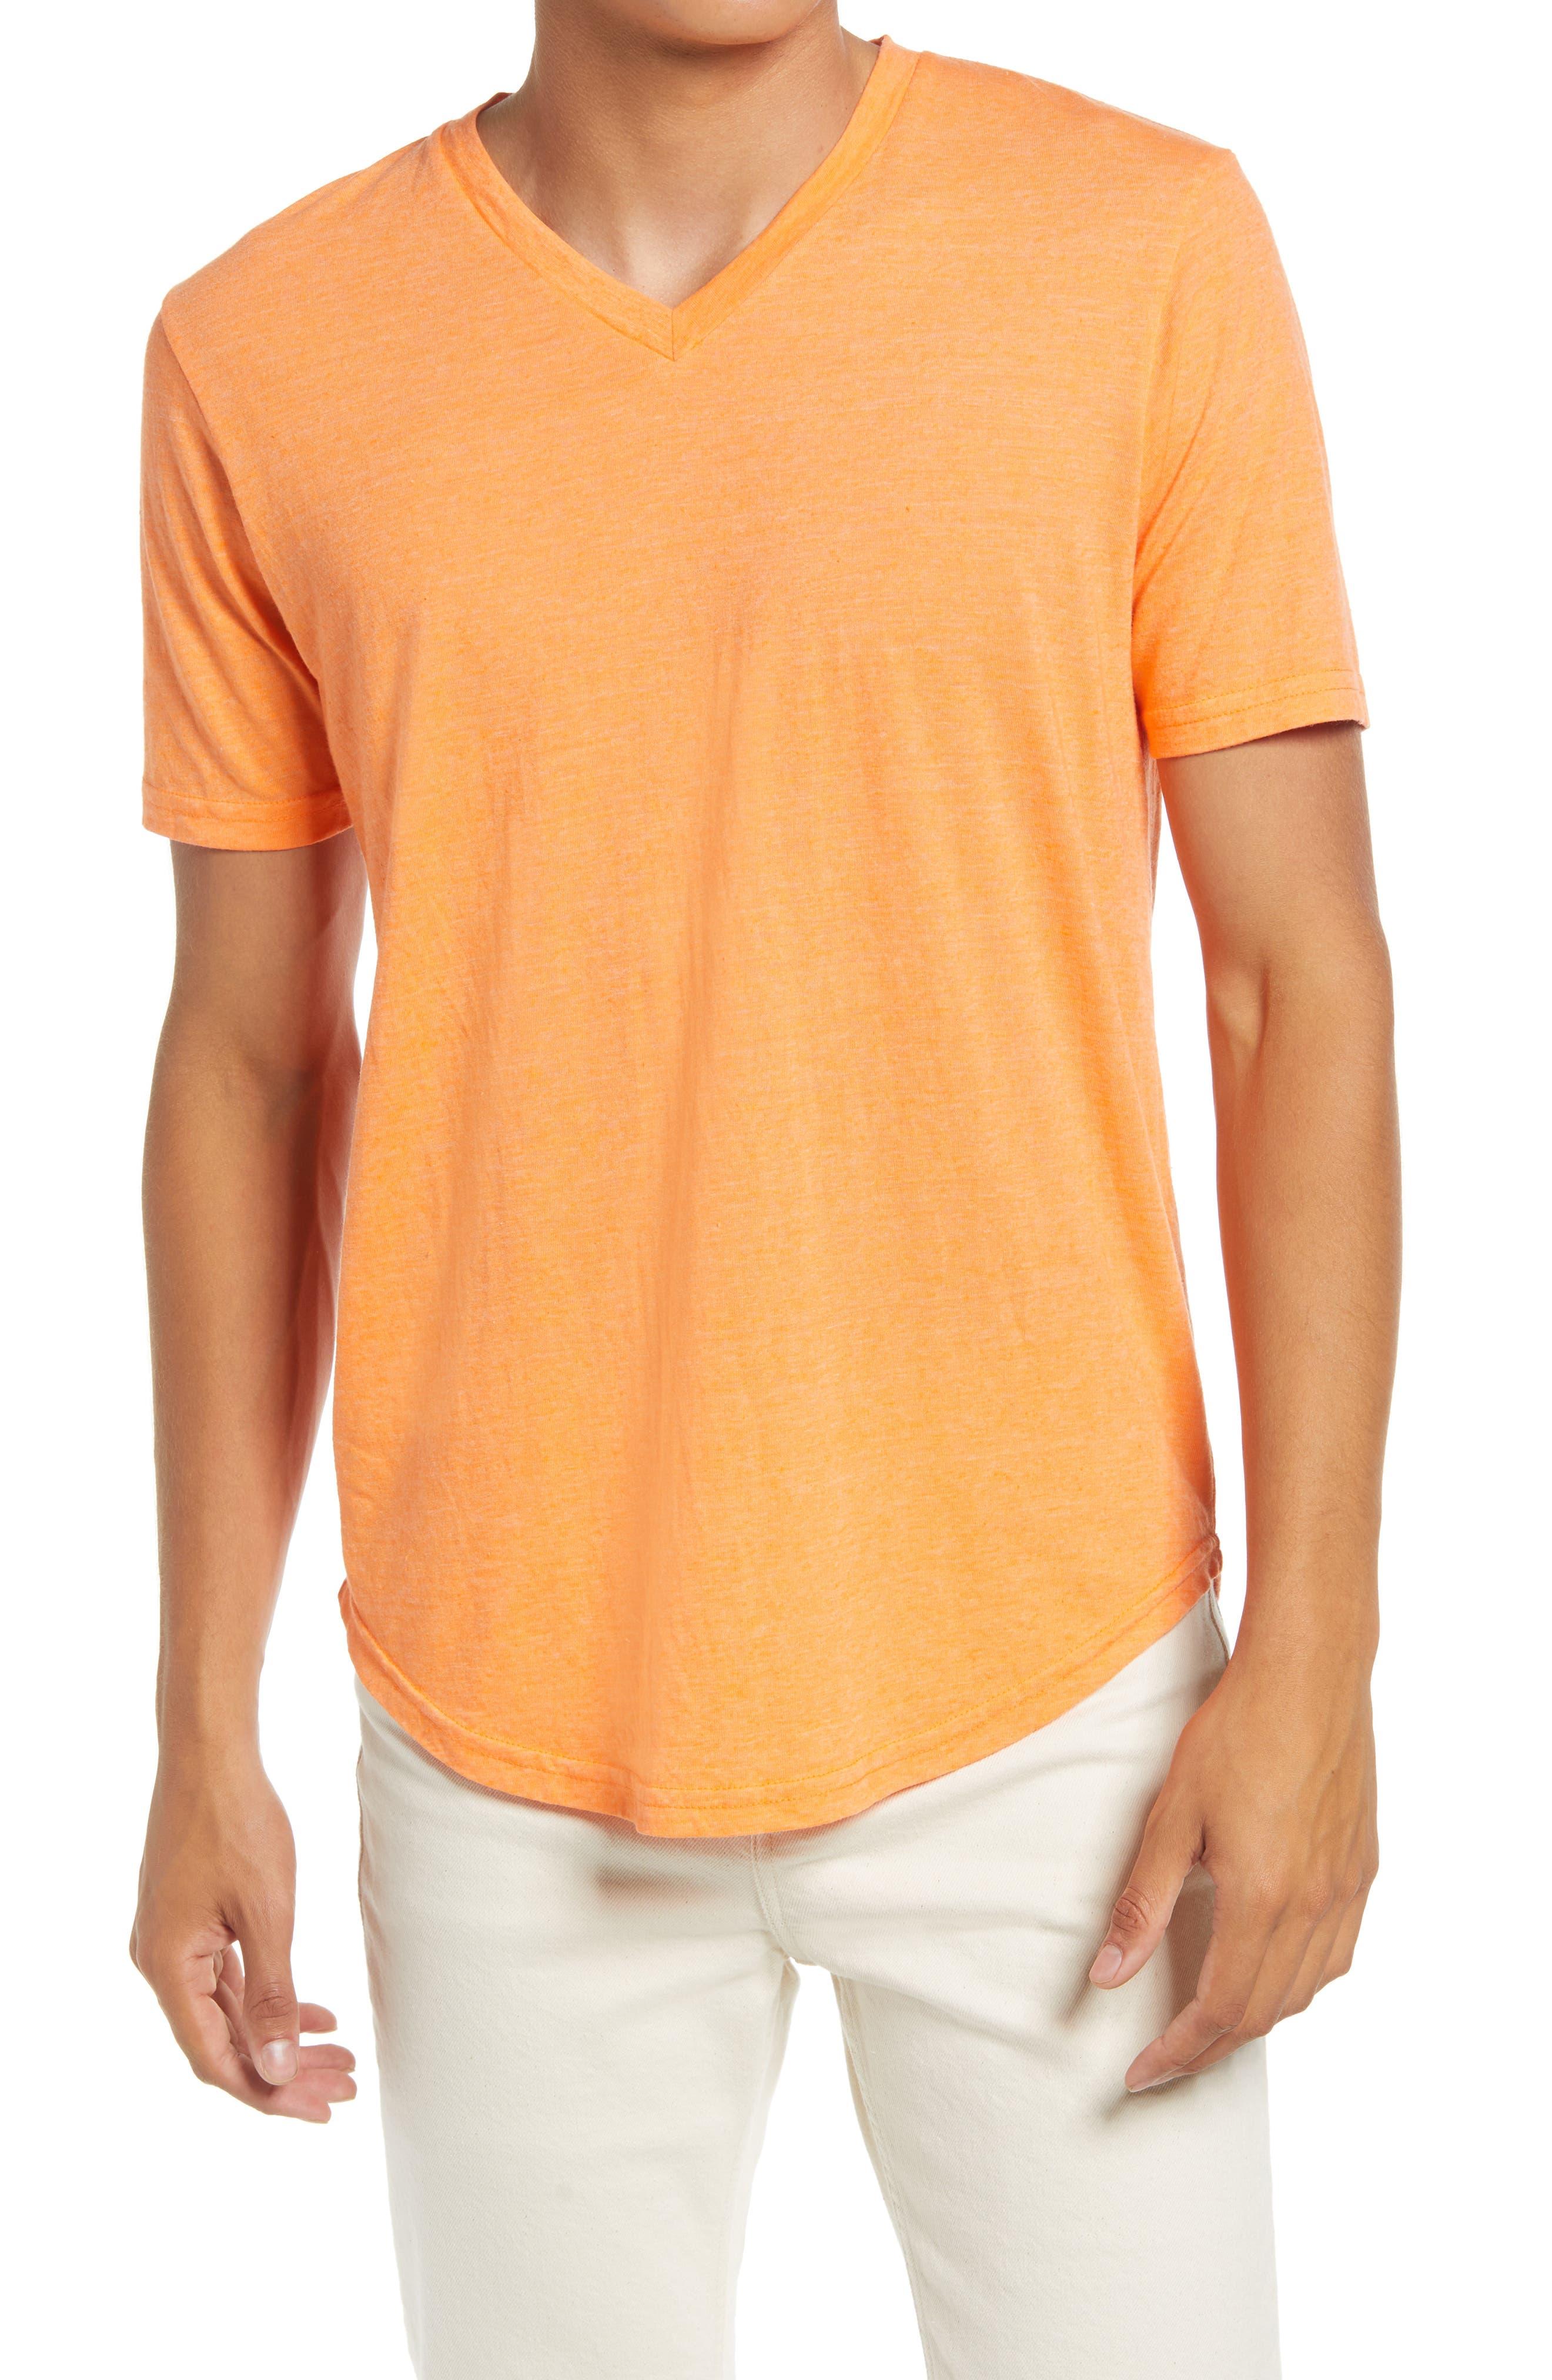 Triblend Scallop V-Neck T-Shirt